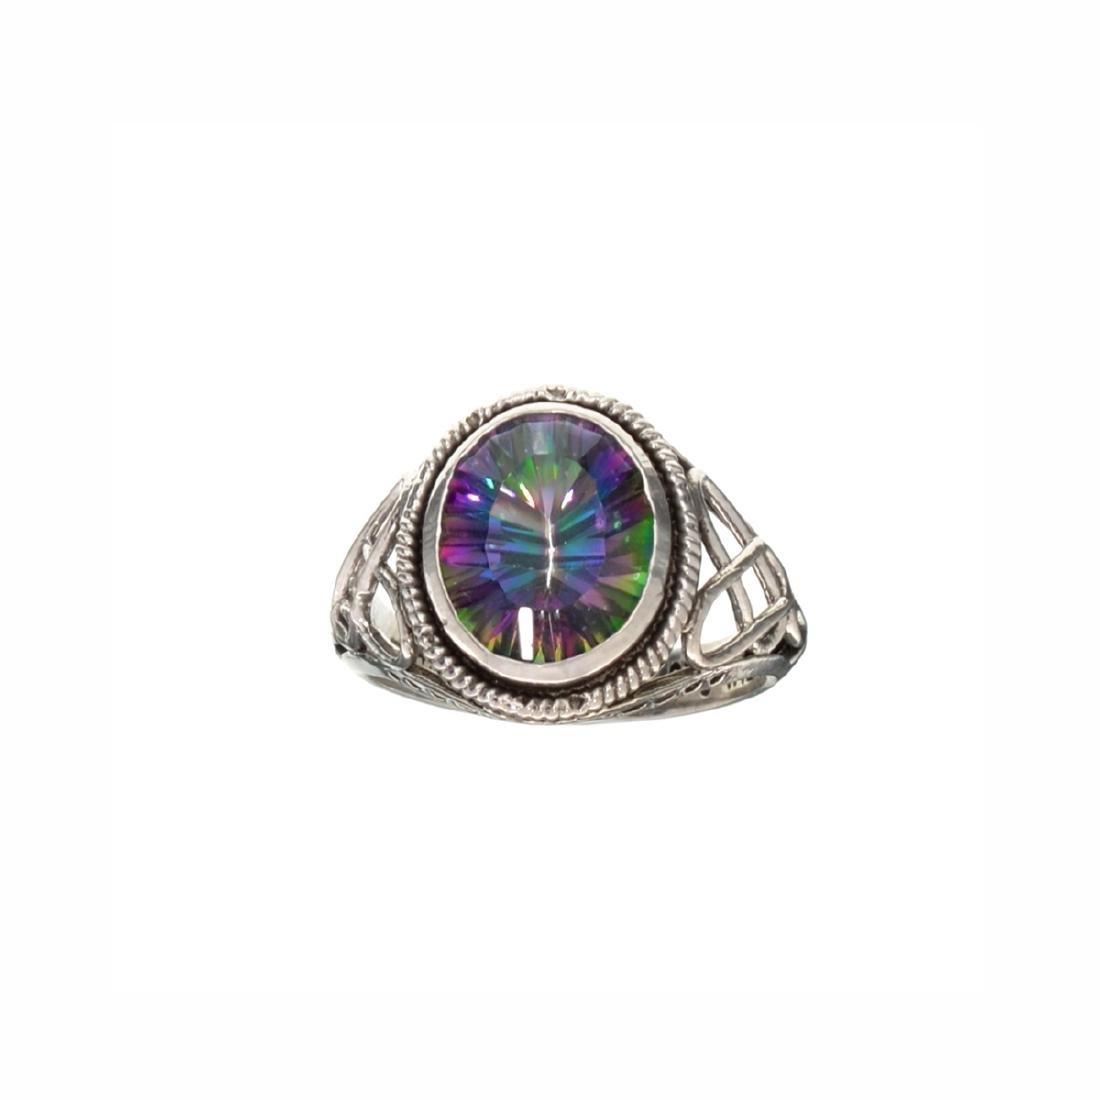 APP: 0.5k Fine Jewelry Designer Sebastian 2.66CT Oval